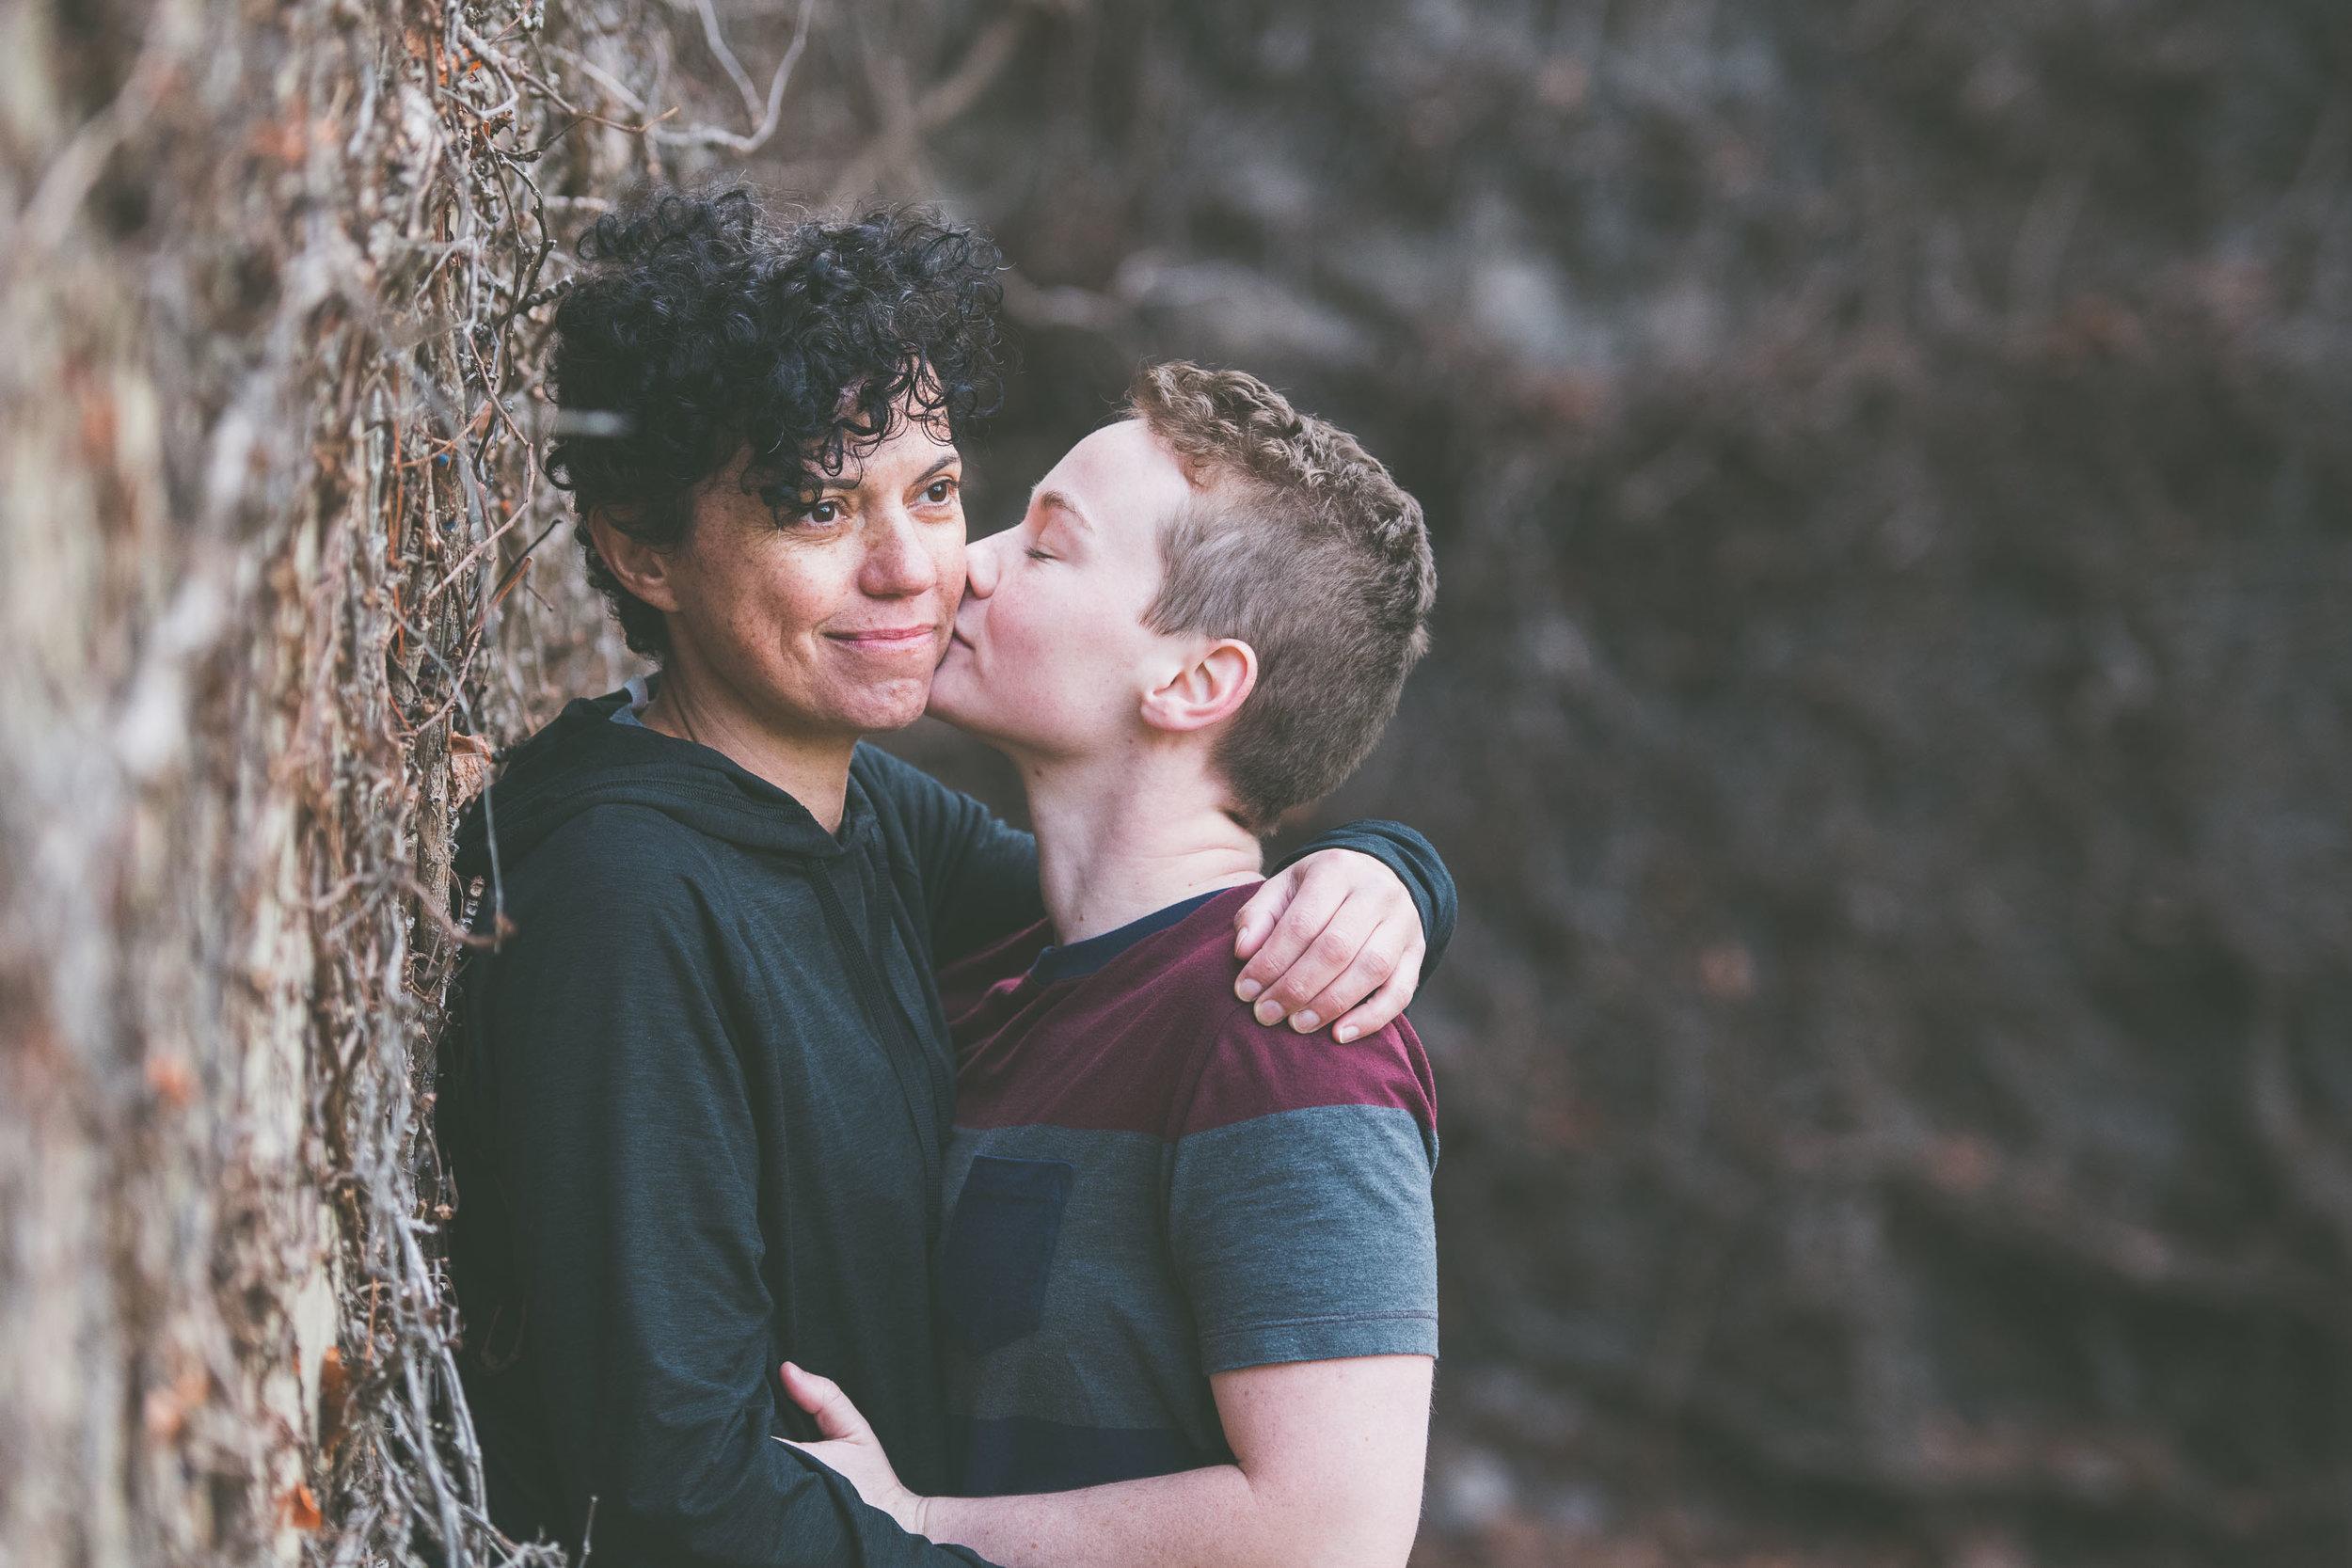 Nahila and Renee - 1 July 2019 - Photo credit Nicola Bailey - 142 - sized for web.jpg